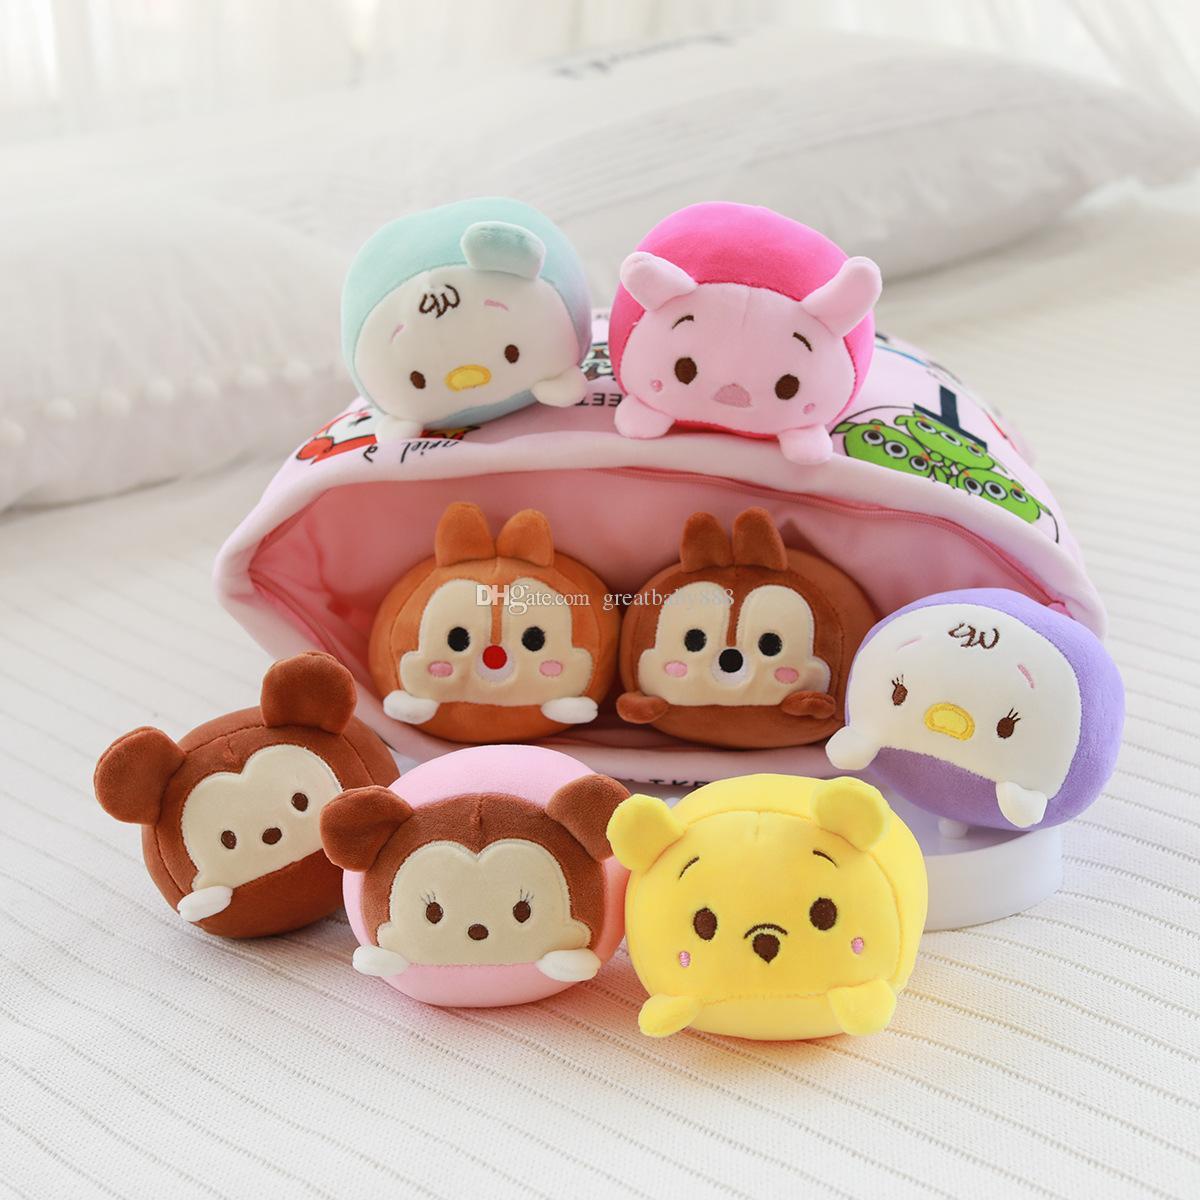 New ins38*48cm super cute a bag cartoon anime doll plush doll children pillow toy birthday gift P082